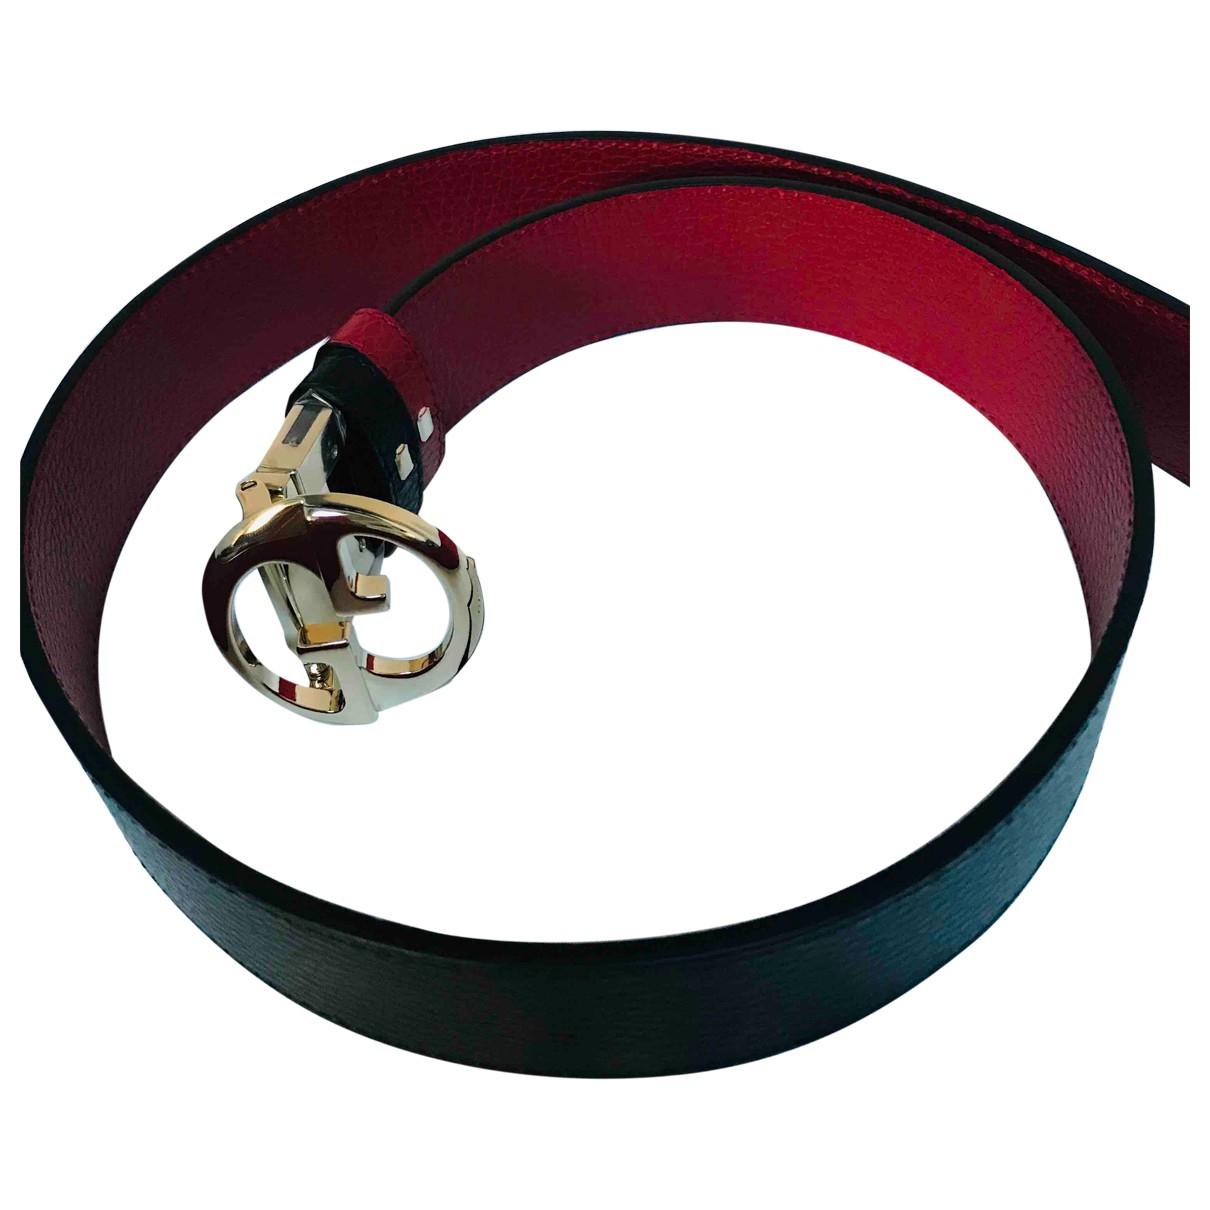 Gucci Interlocking Buckle Black Leather belt for Women 80 cm